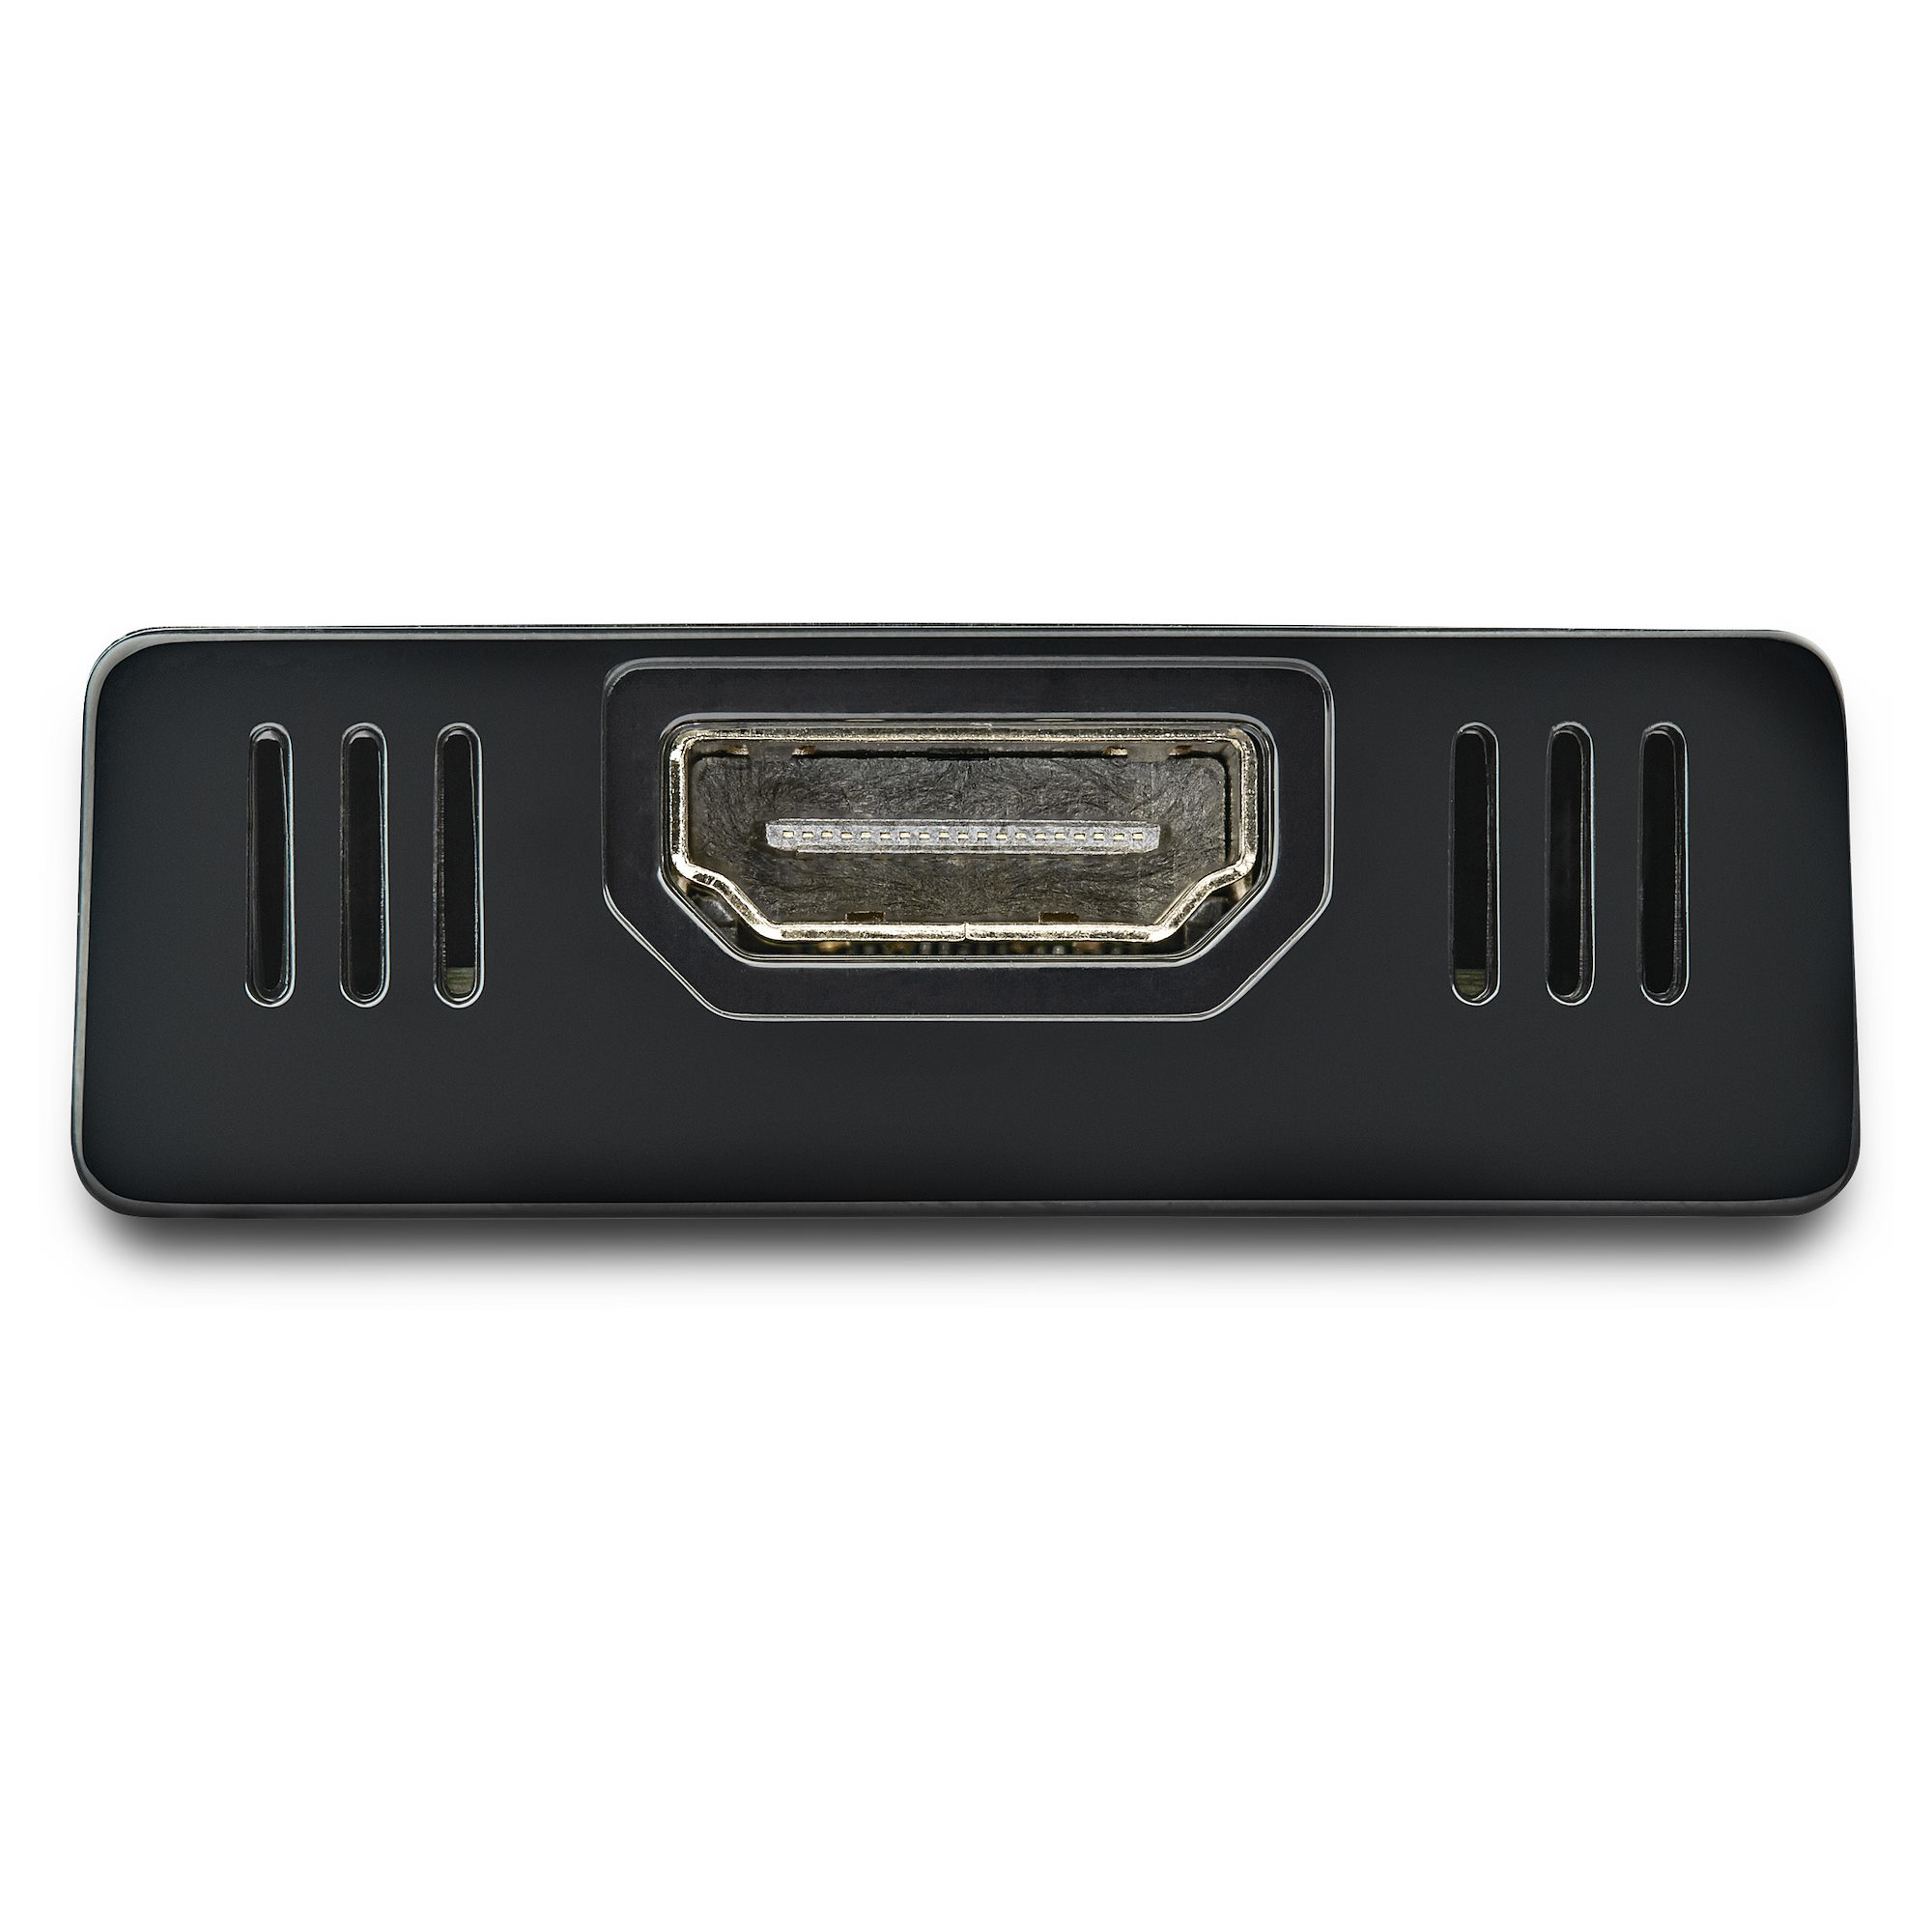 USB 3.0 naar 4K HDMI External Multi Monitor Video Graphics Adapter